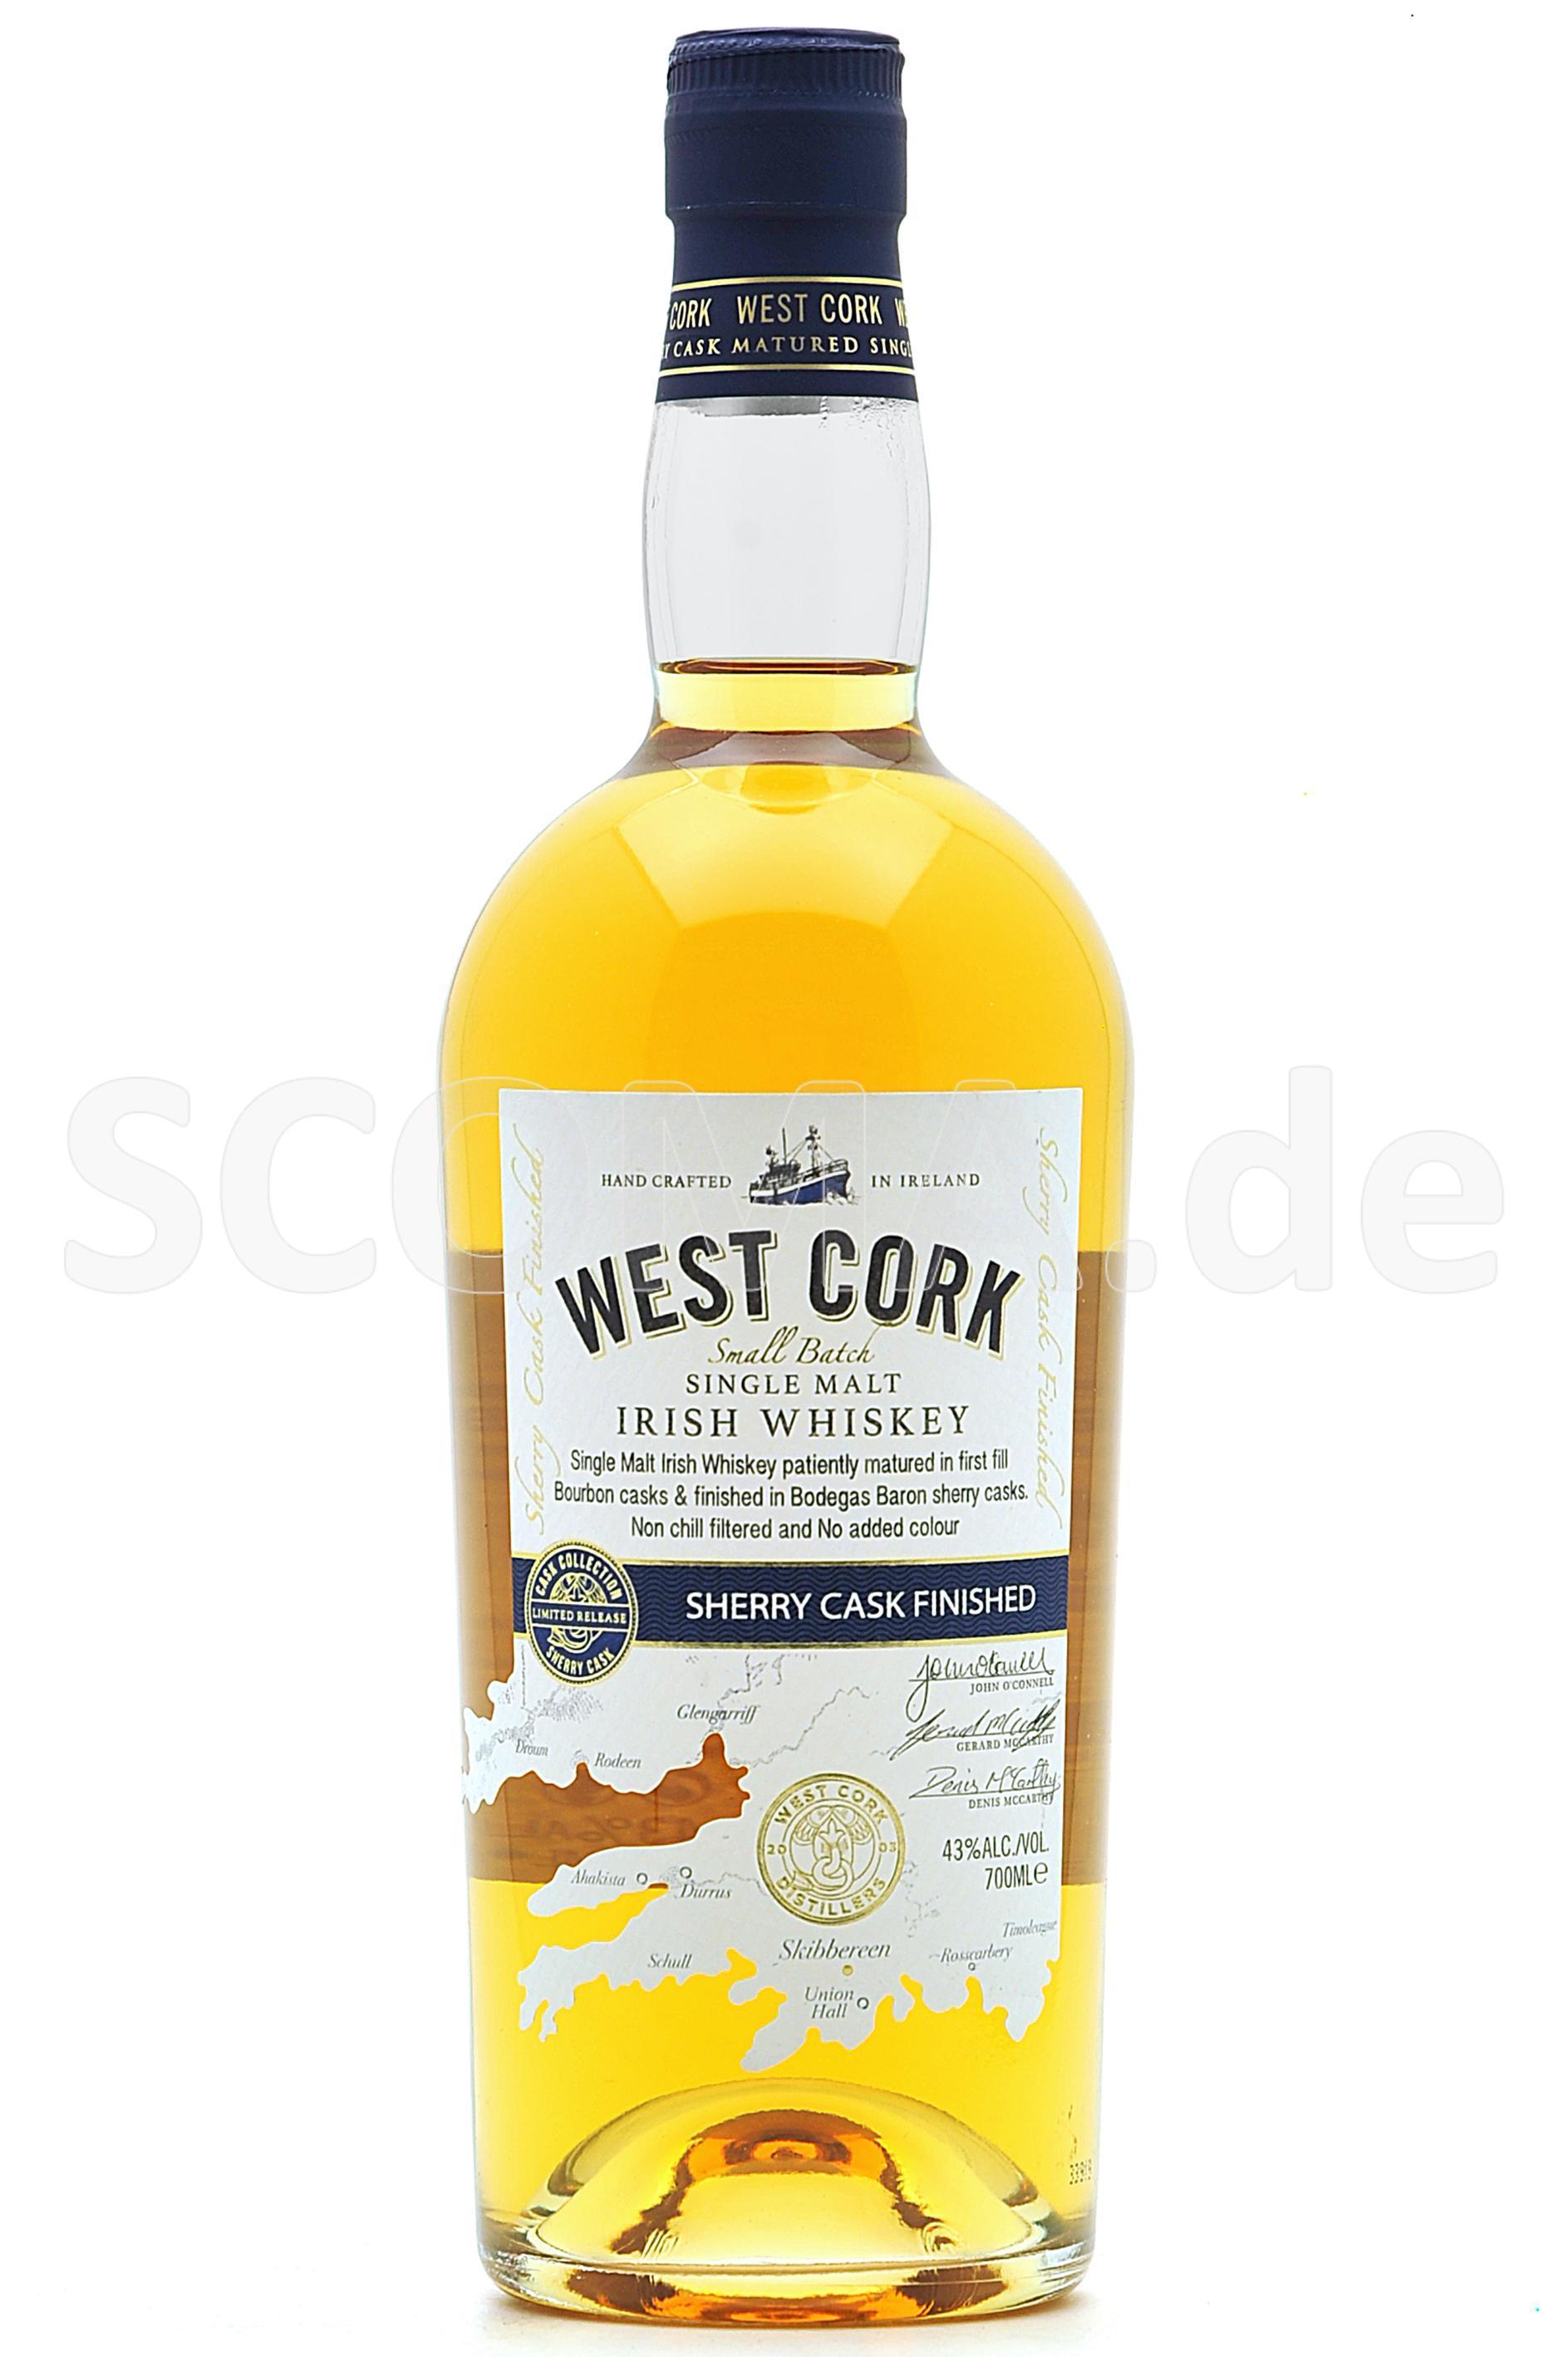 West Cork Sherry Cask Finish